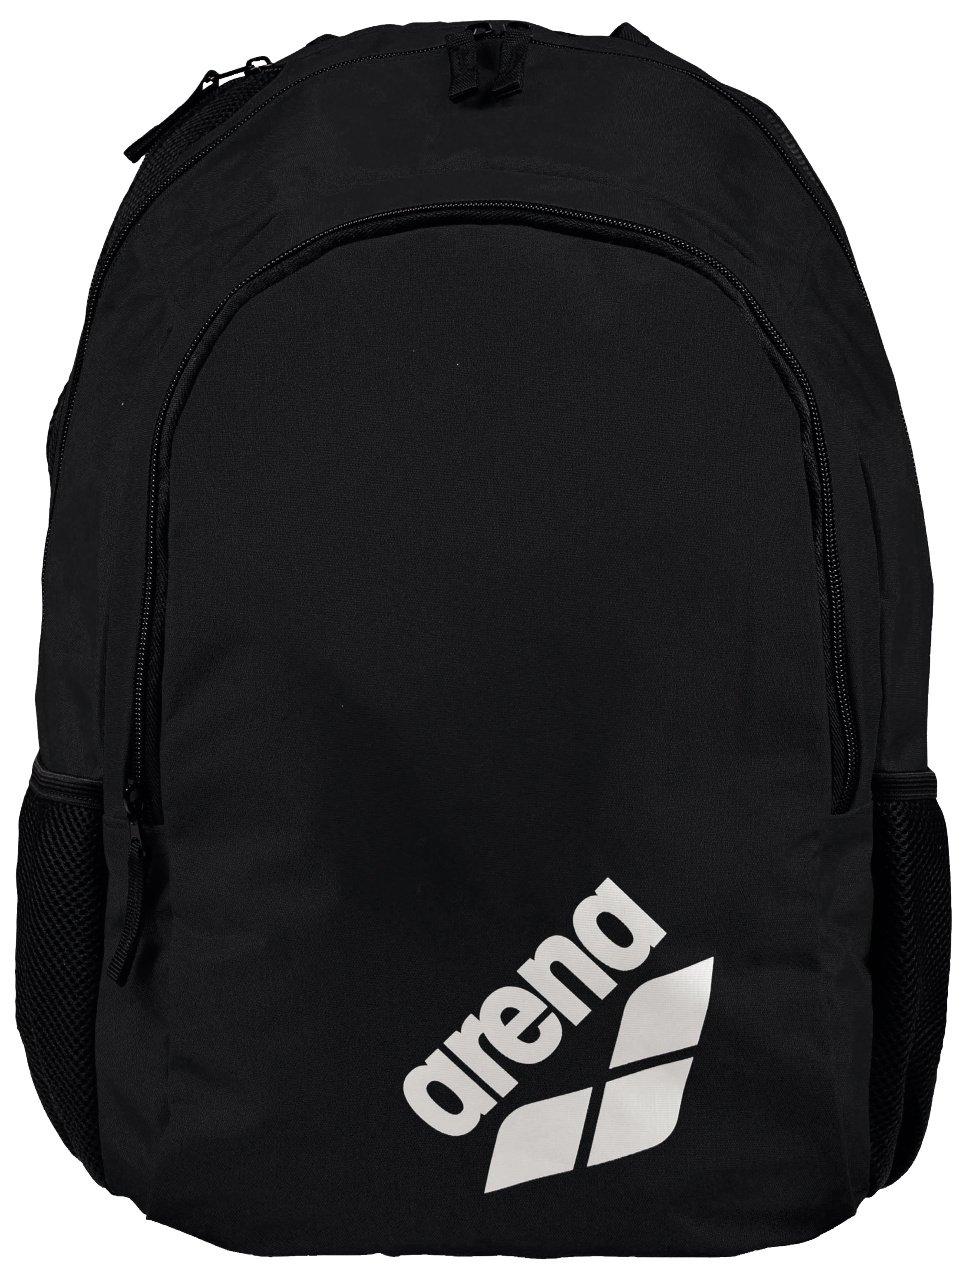 arena Spiky 2 Swim Backpack, Black Team